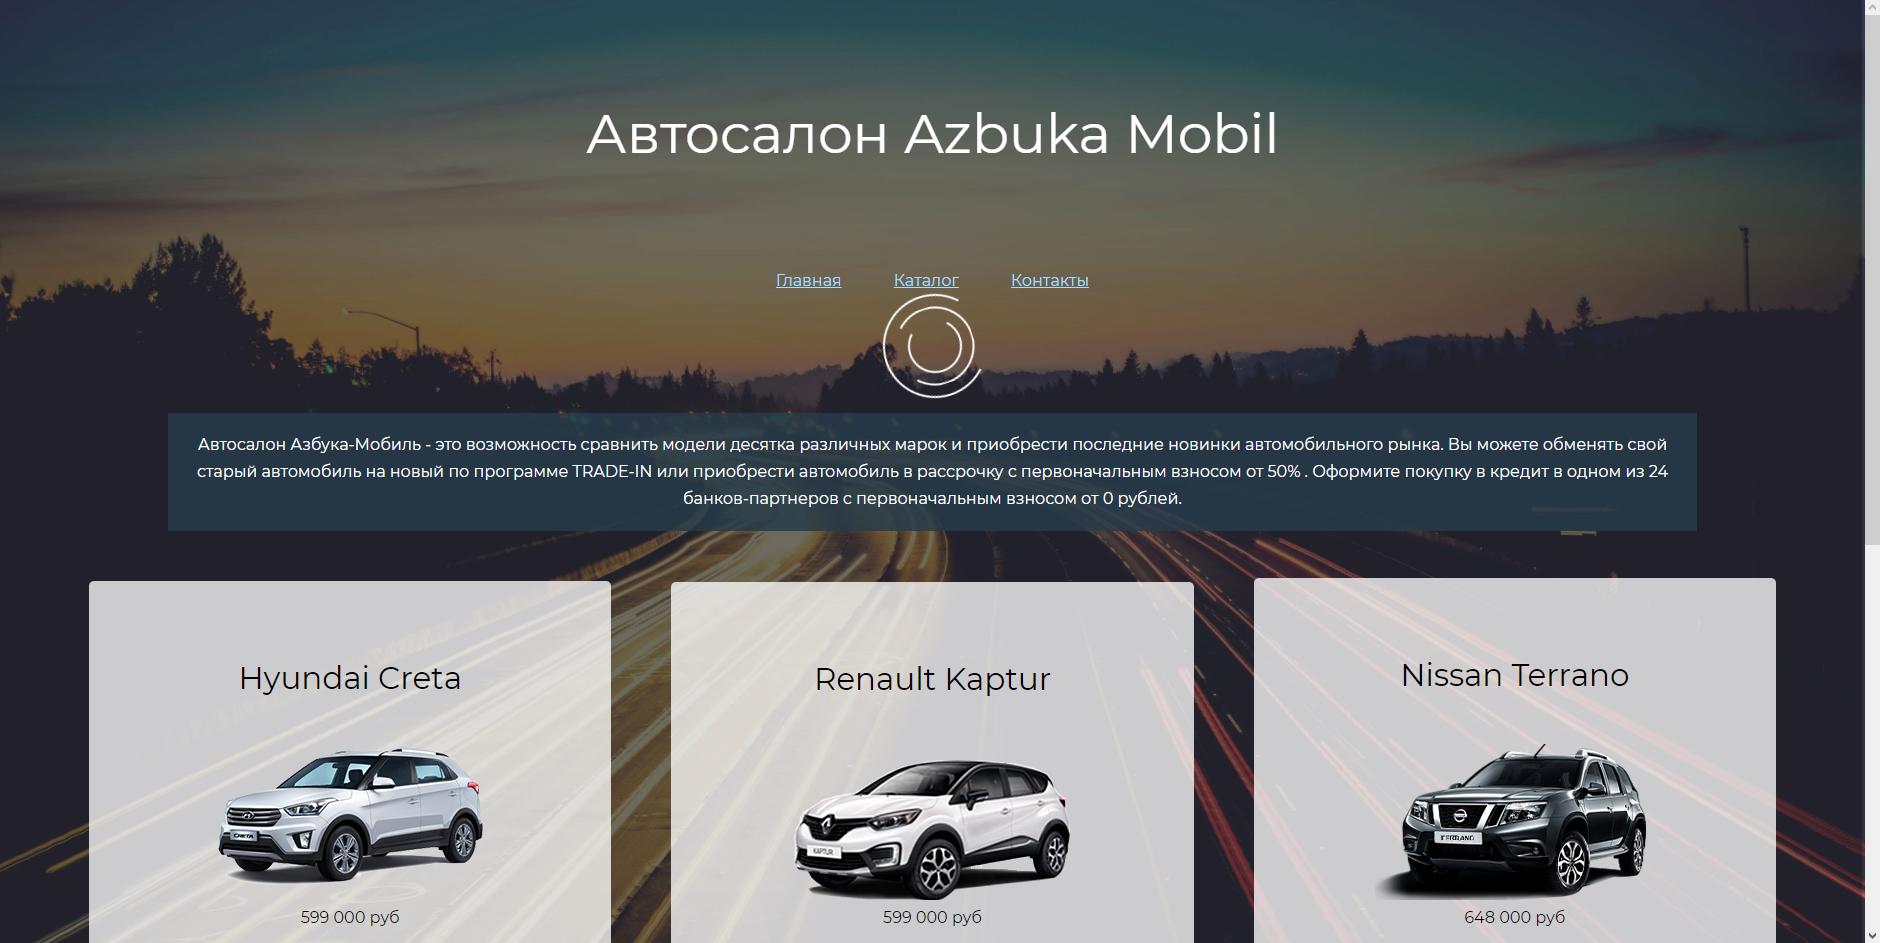 Азбука-Мобиль